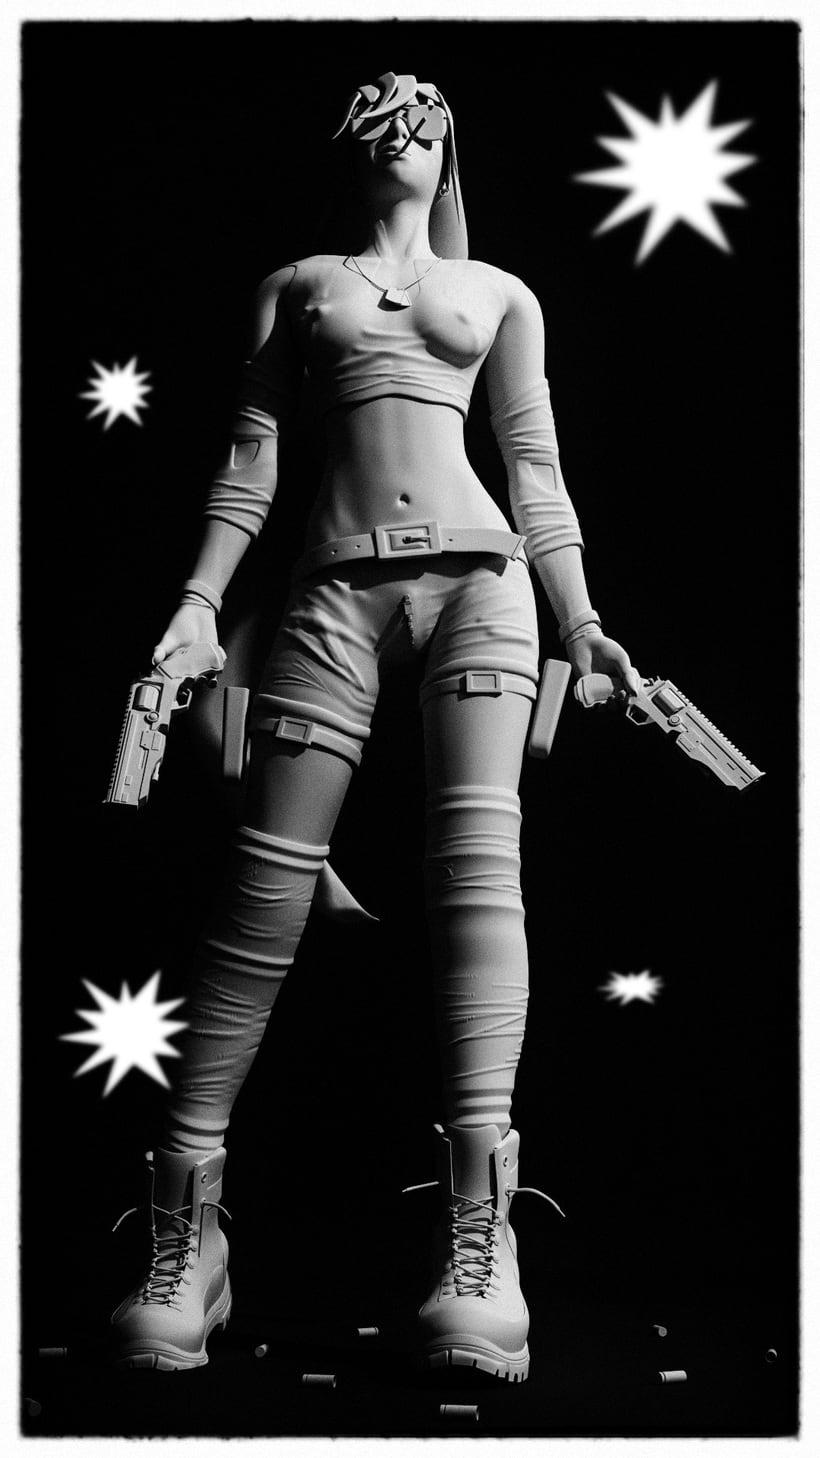 Blender Sculpt - GunGirl 2